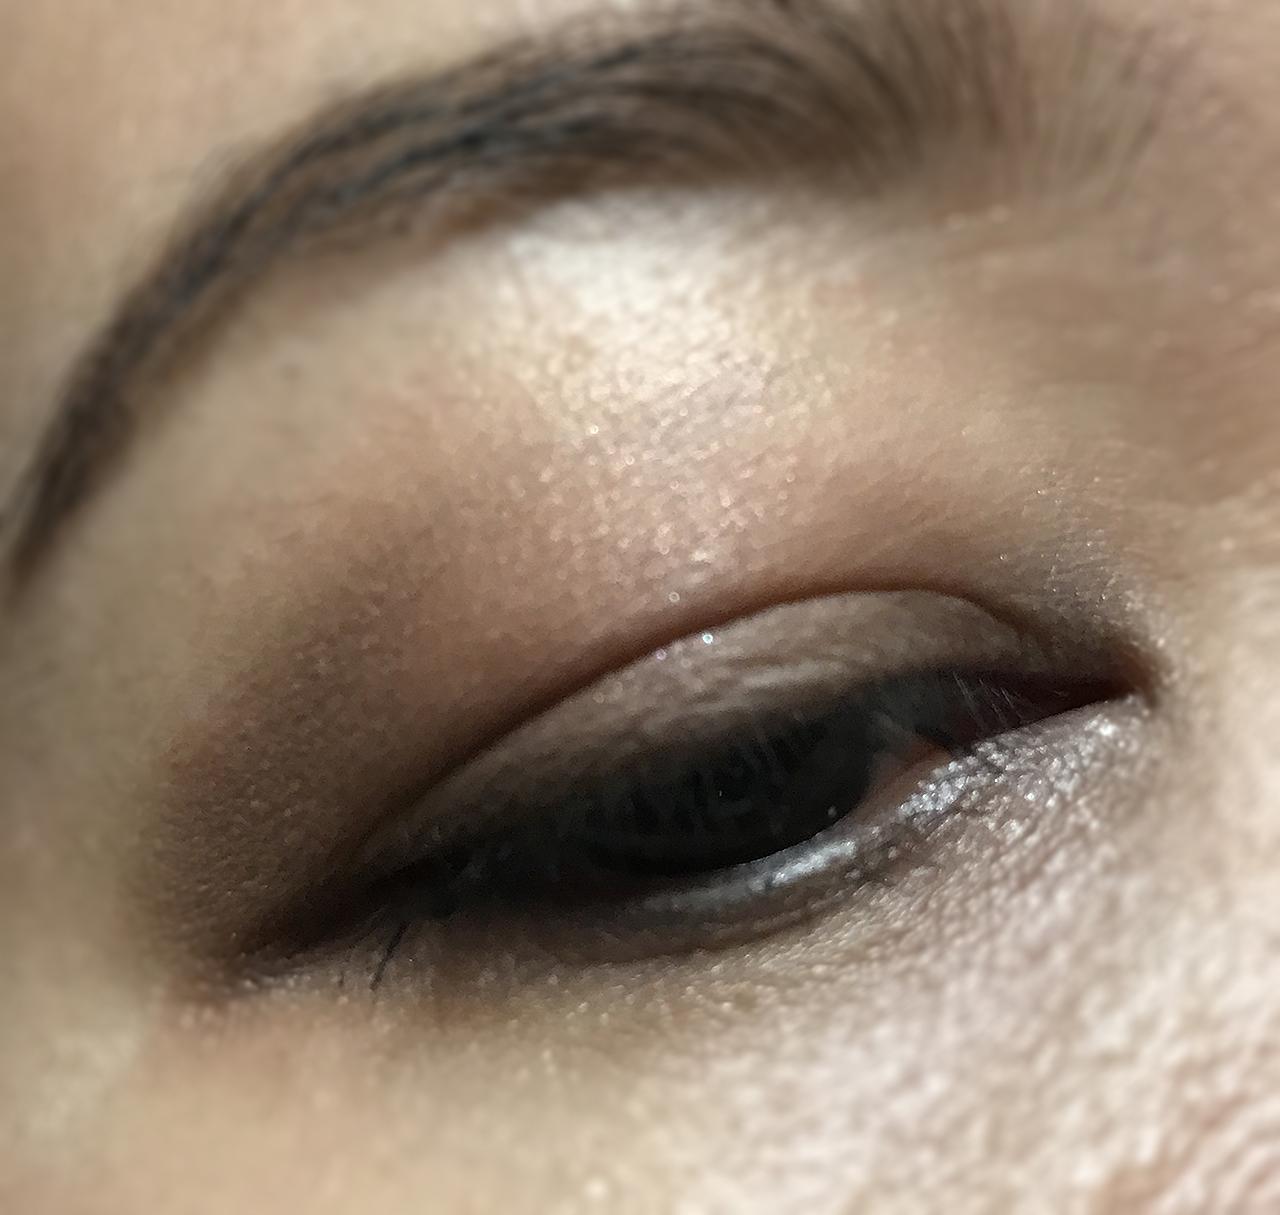 Zoeva The Basic Moment Eyeshadow Palette eye makeup look 1